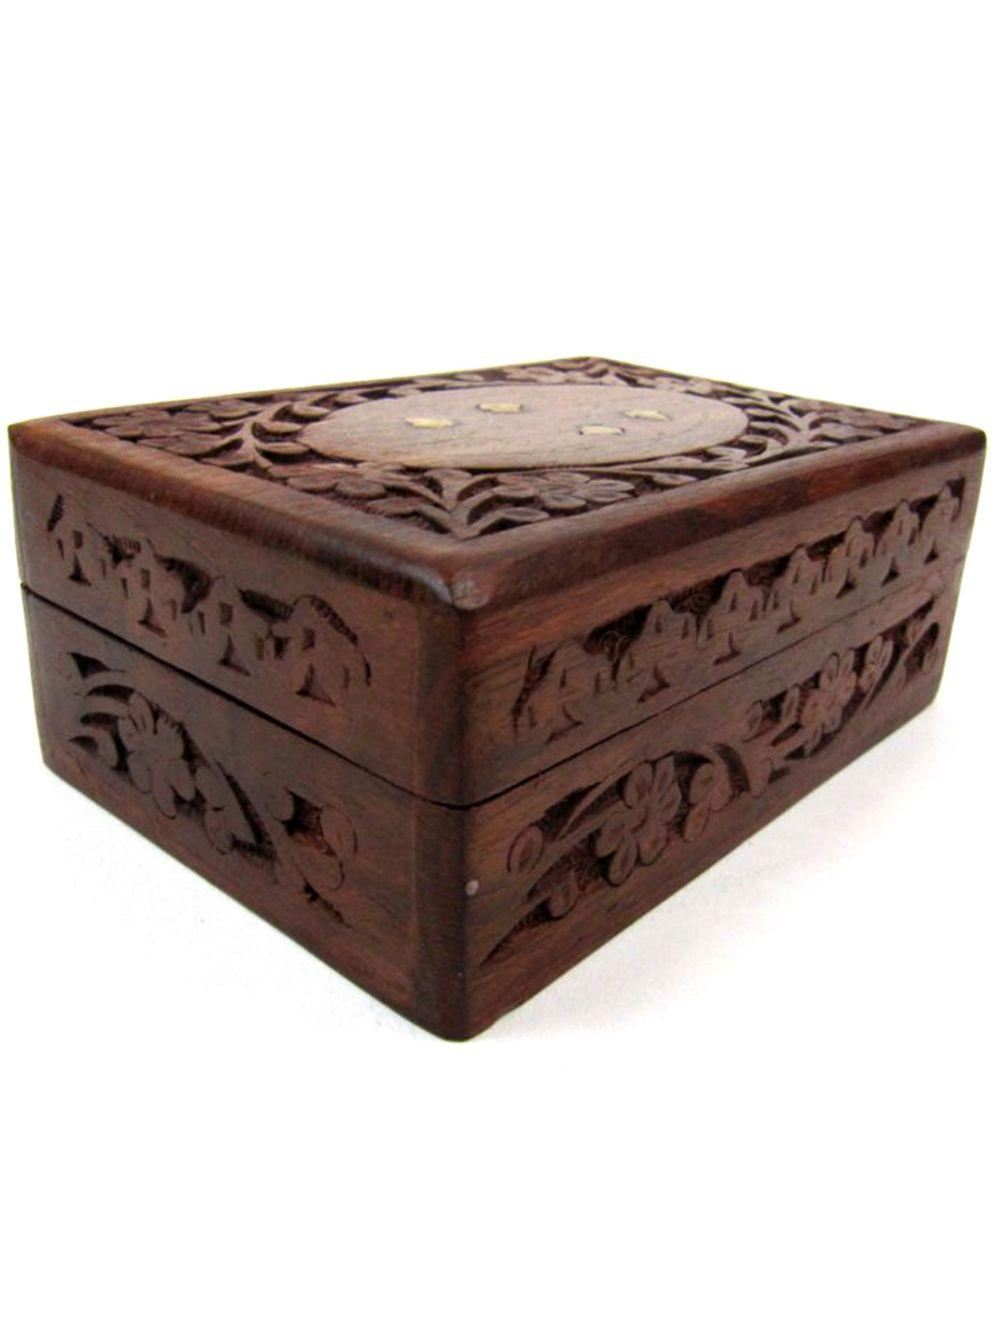 Carved Sheesham Wood Box Inlay Design